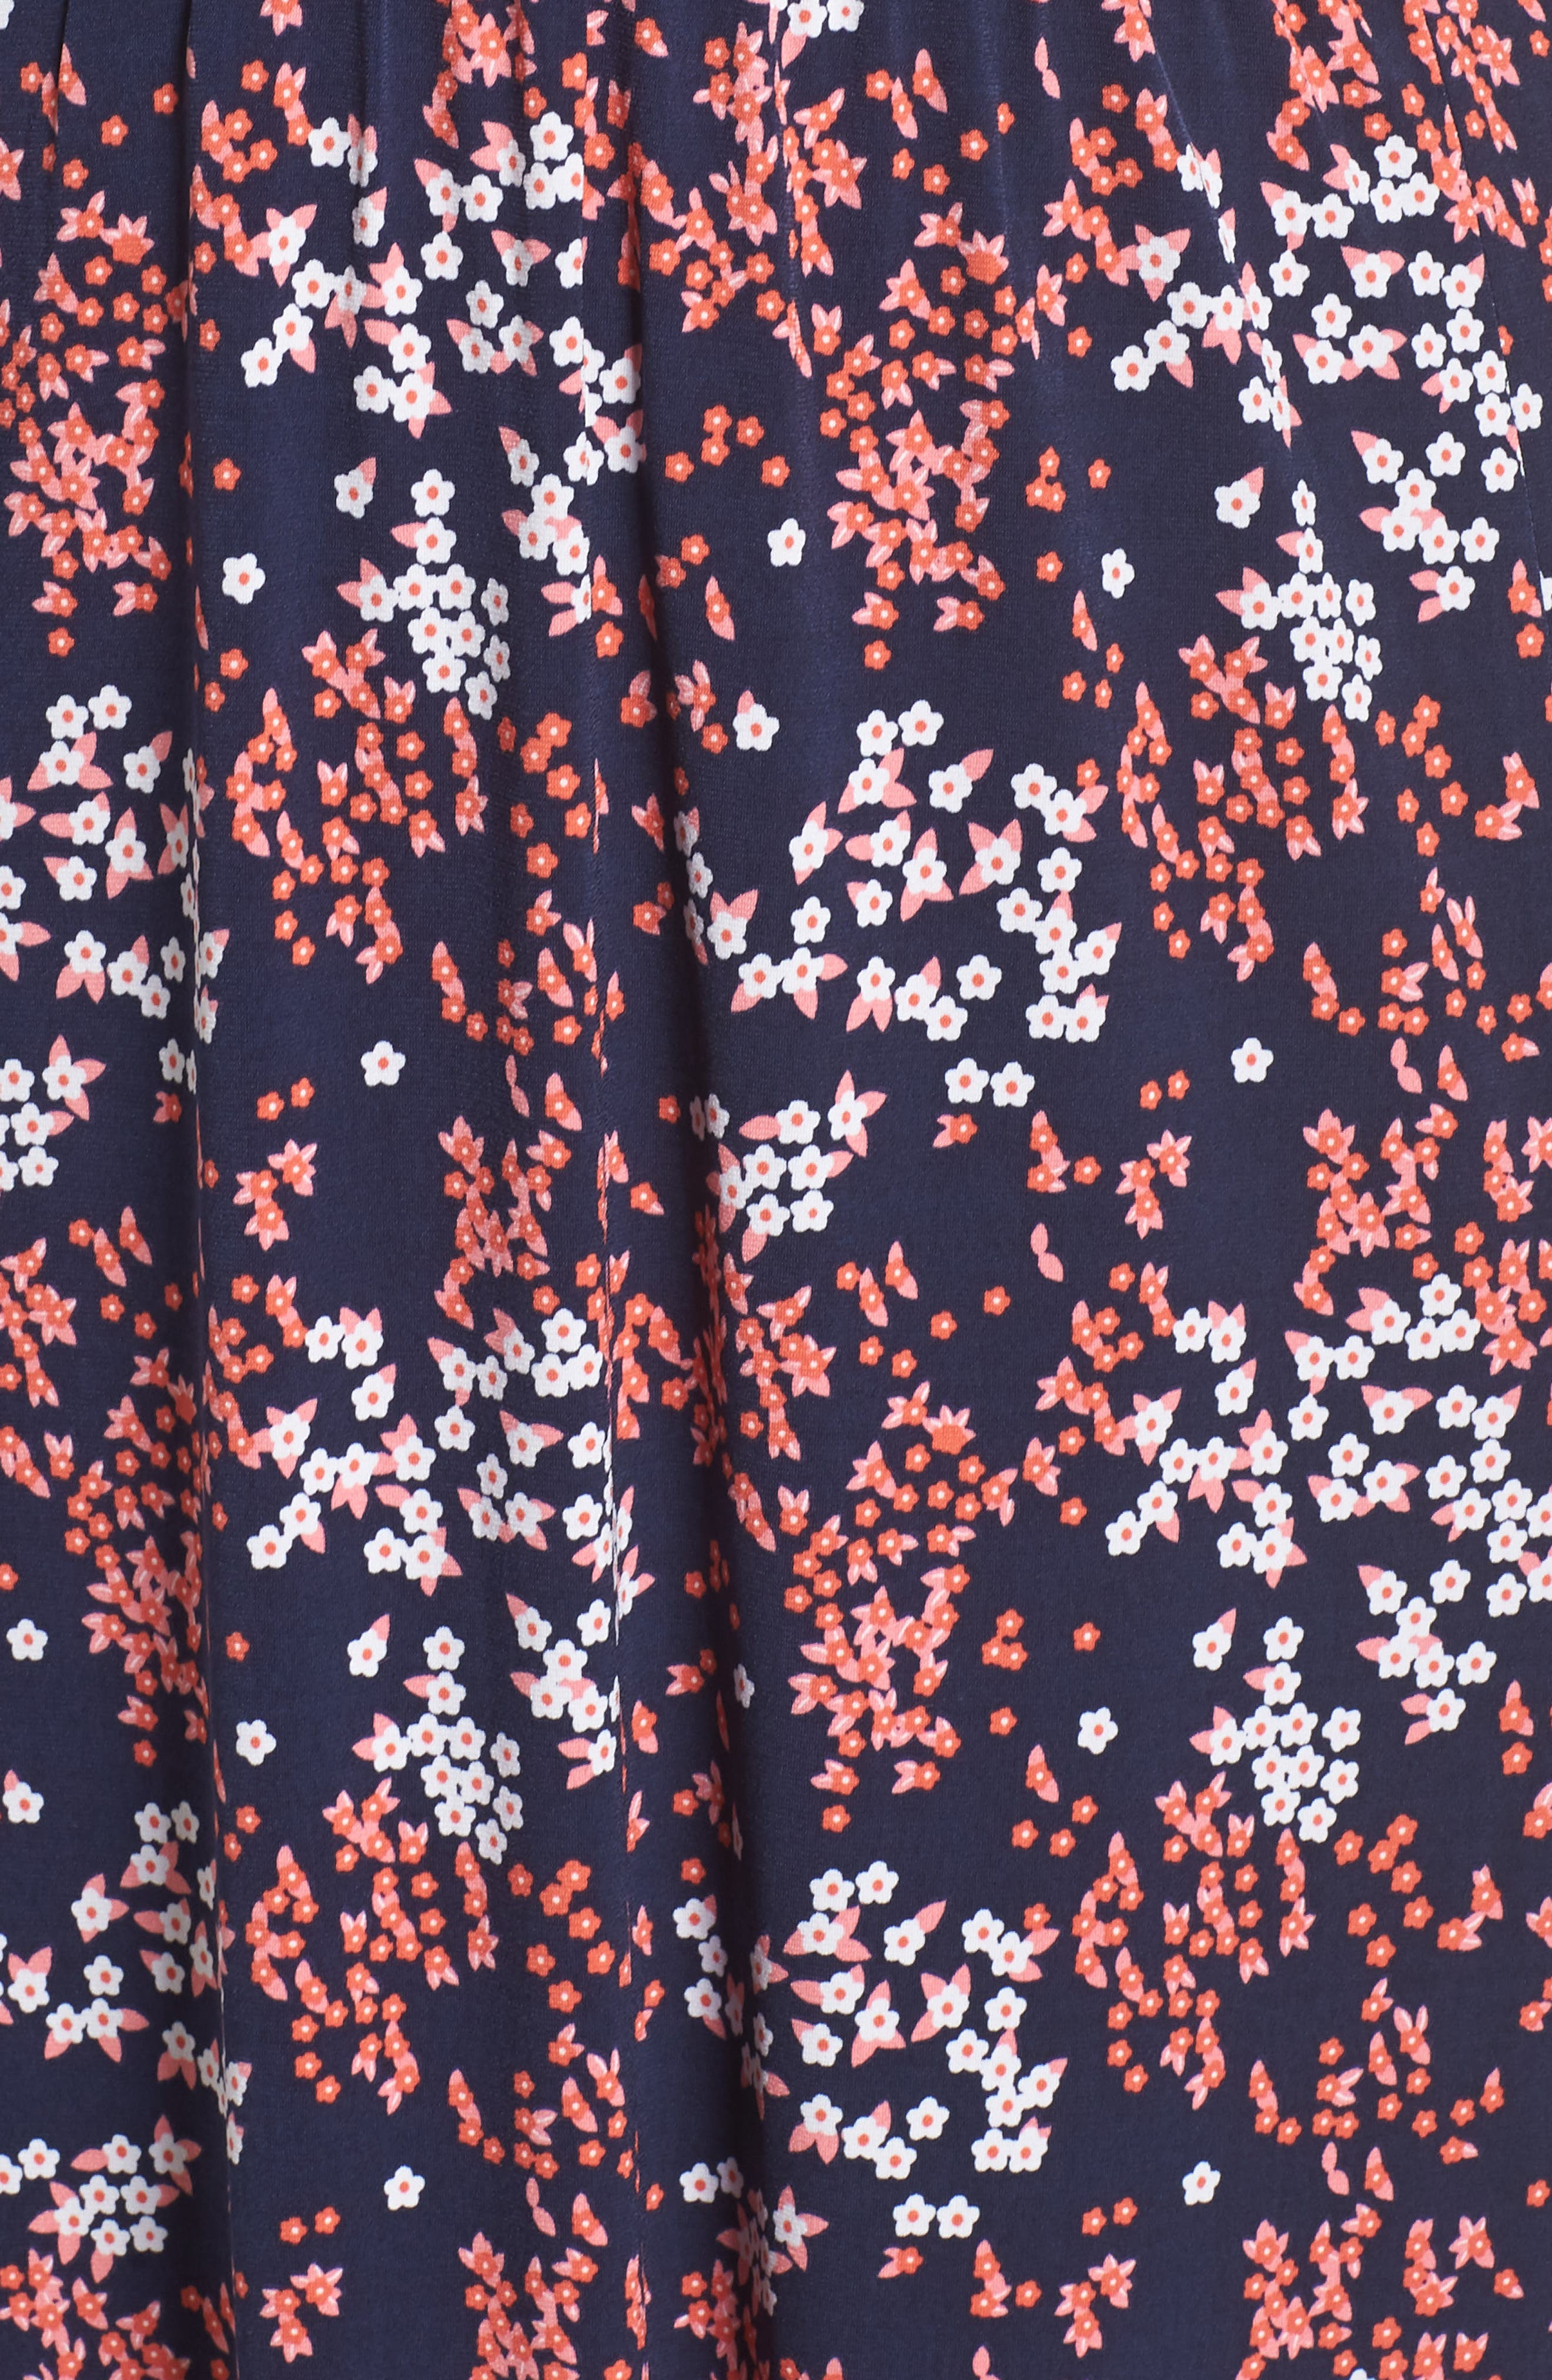 Floral Print Maxi Dress,                             Alternate thumbnail 6, color,